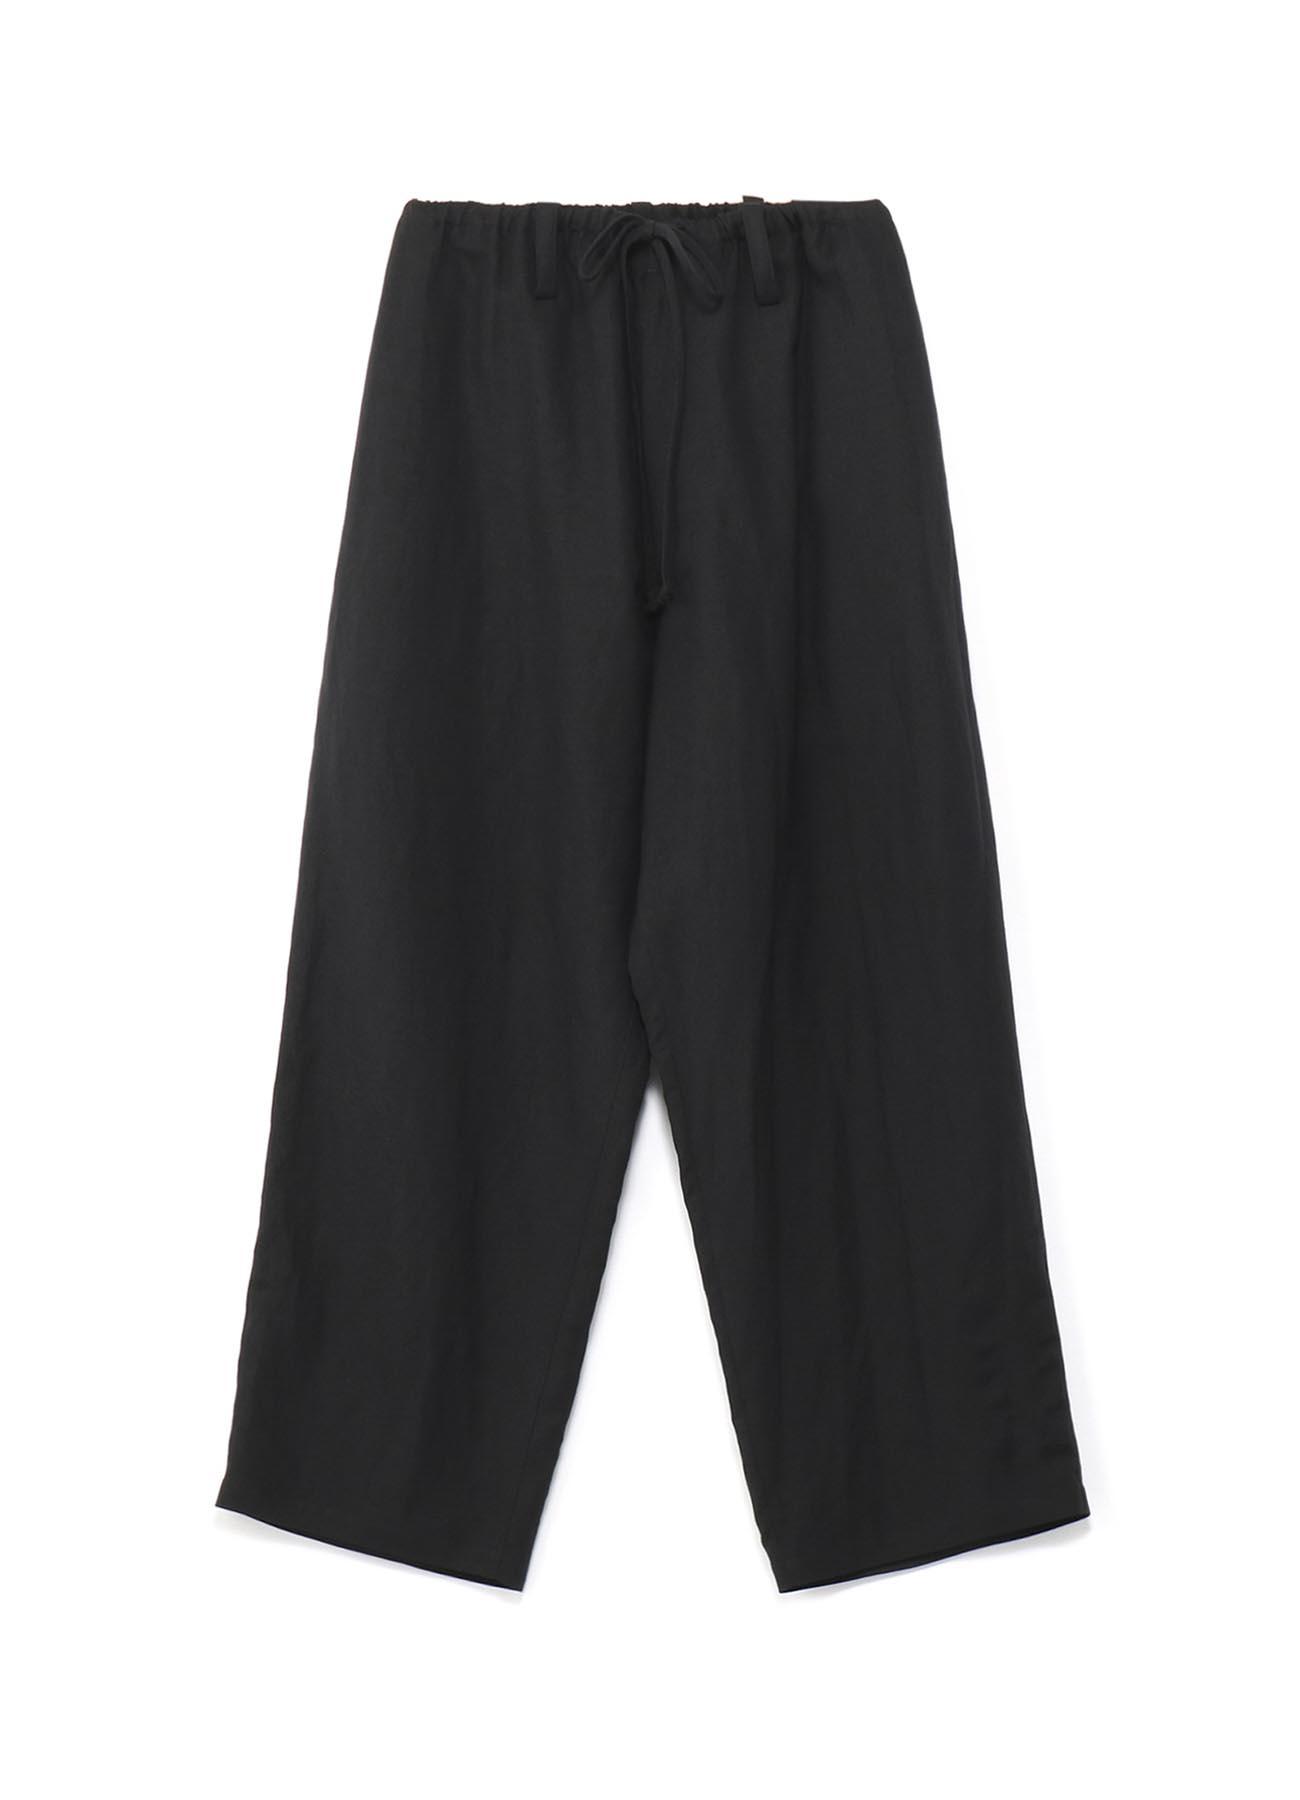 Rayon/Linen Bio Washer Waist String Pants